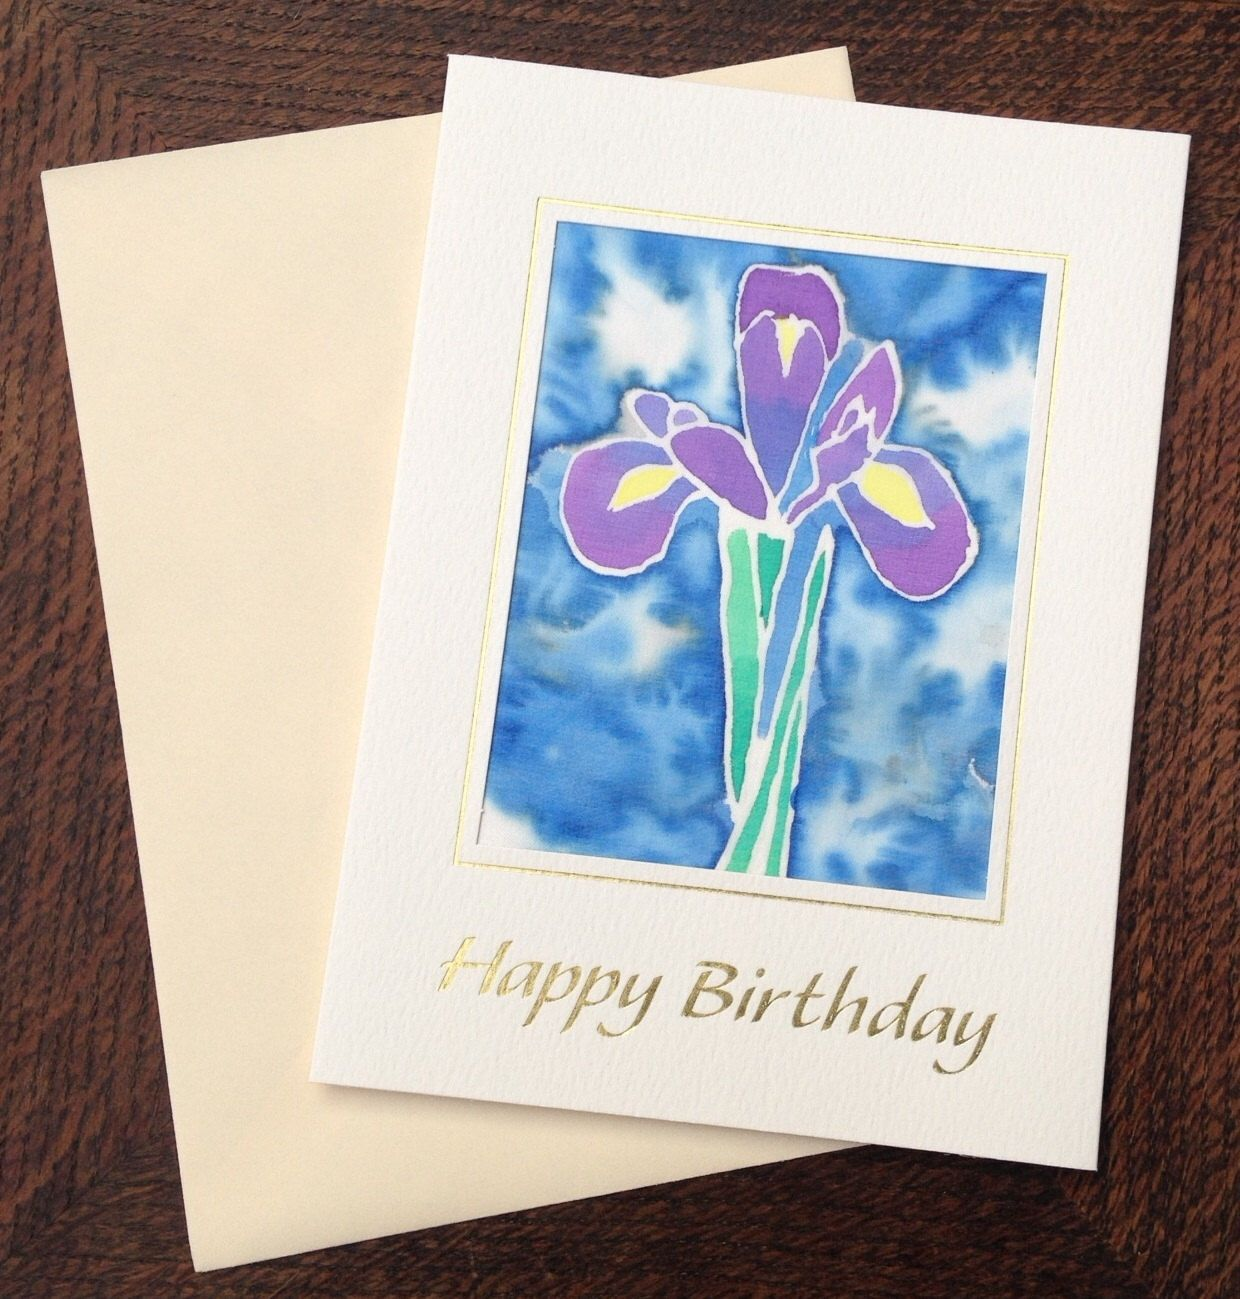 Purple iris birthday card, original silk painting, cream card with gold greeting and cream envelope door icanseetrees op Etsy https://www.etsy.com/nl/listing/199355226/purple-iris-birthday-card-original-silk